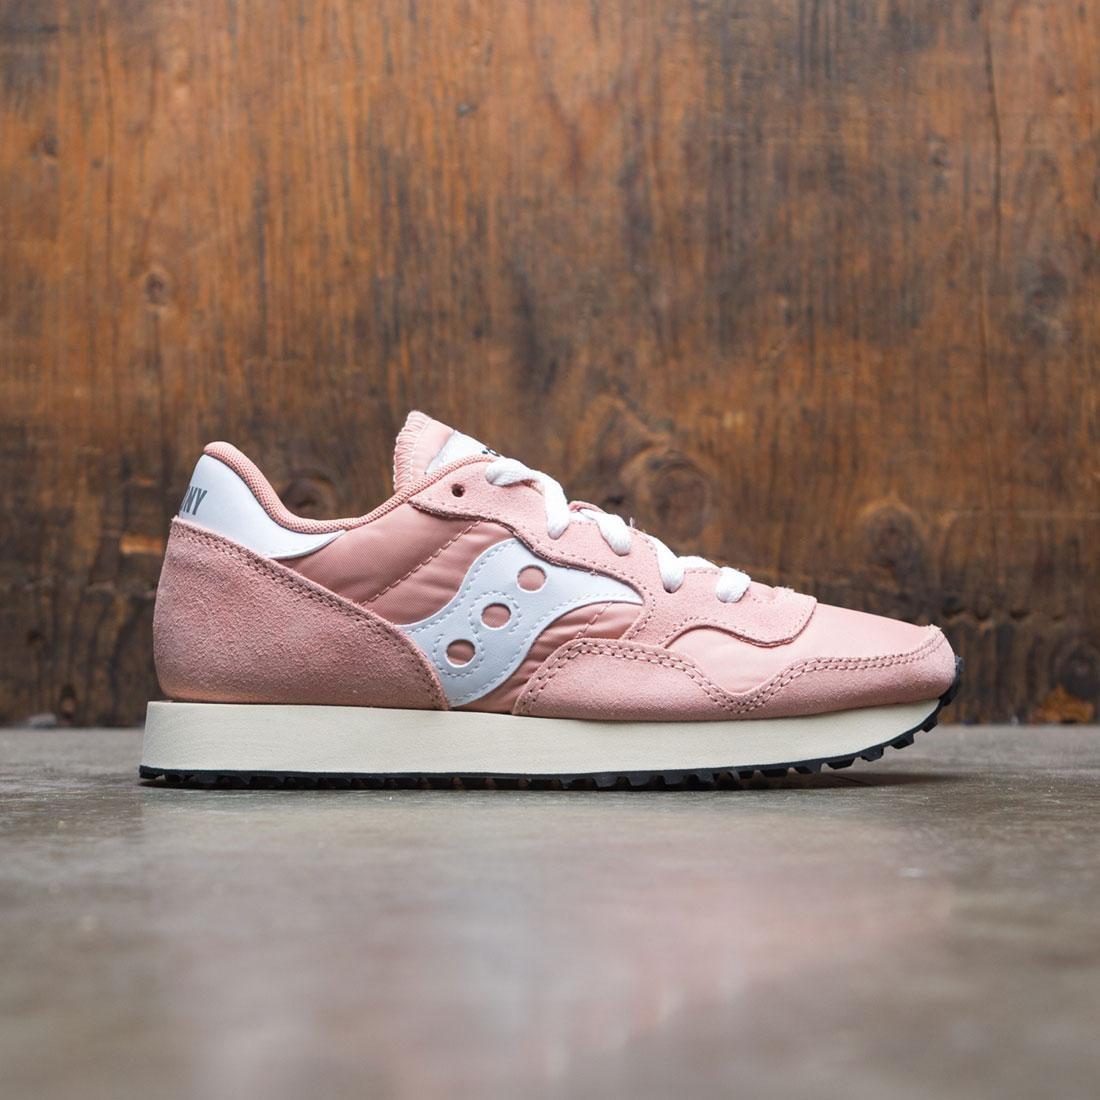 Saucony Women DXN Trainer Vintage (pink / peach / white)